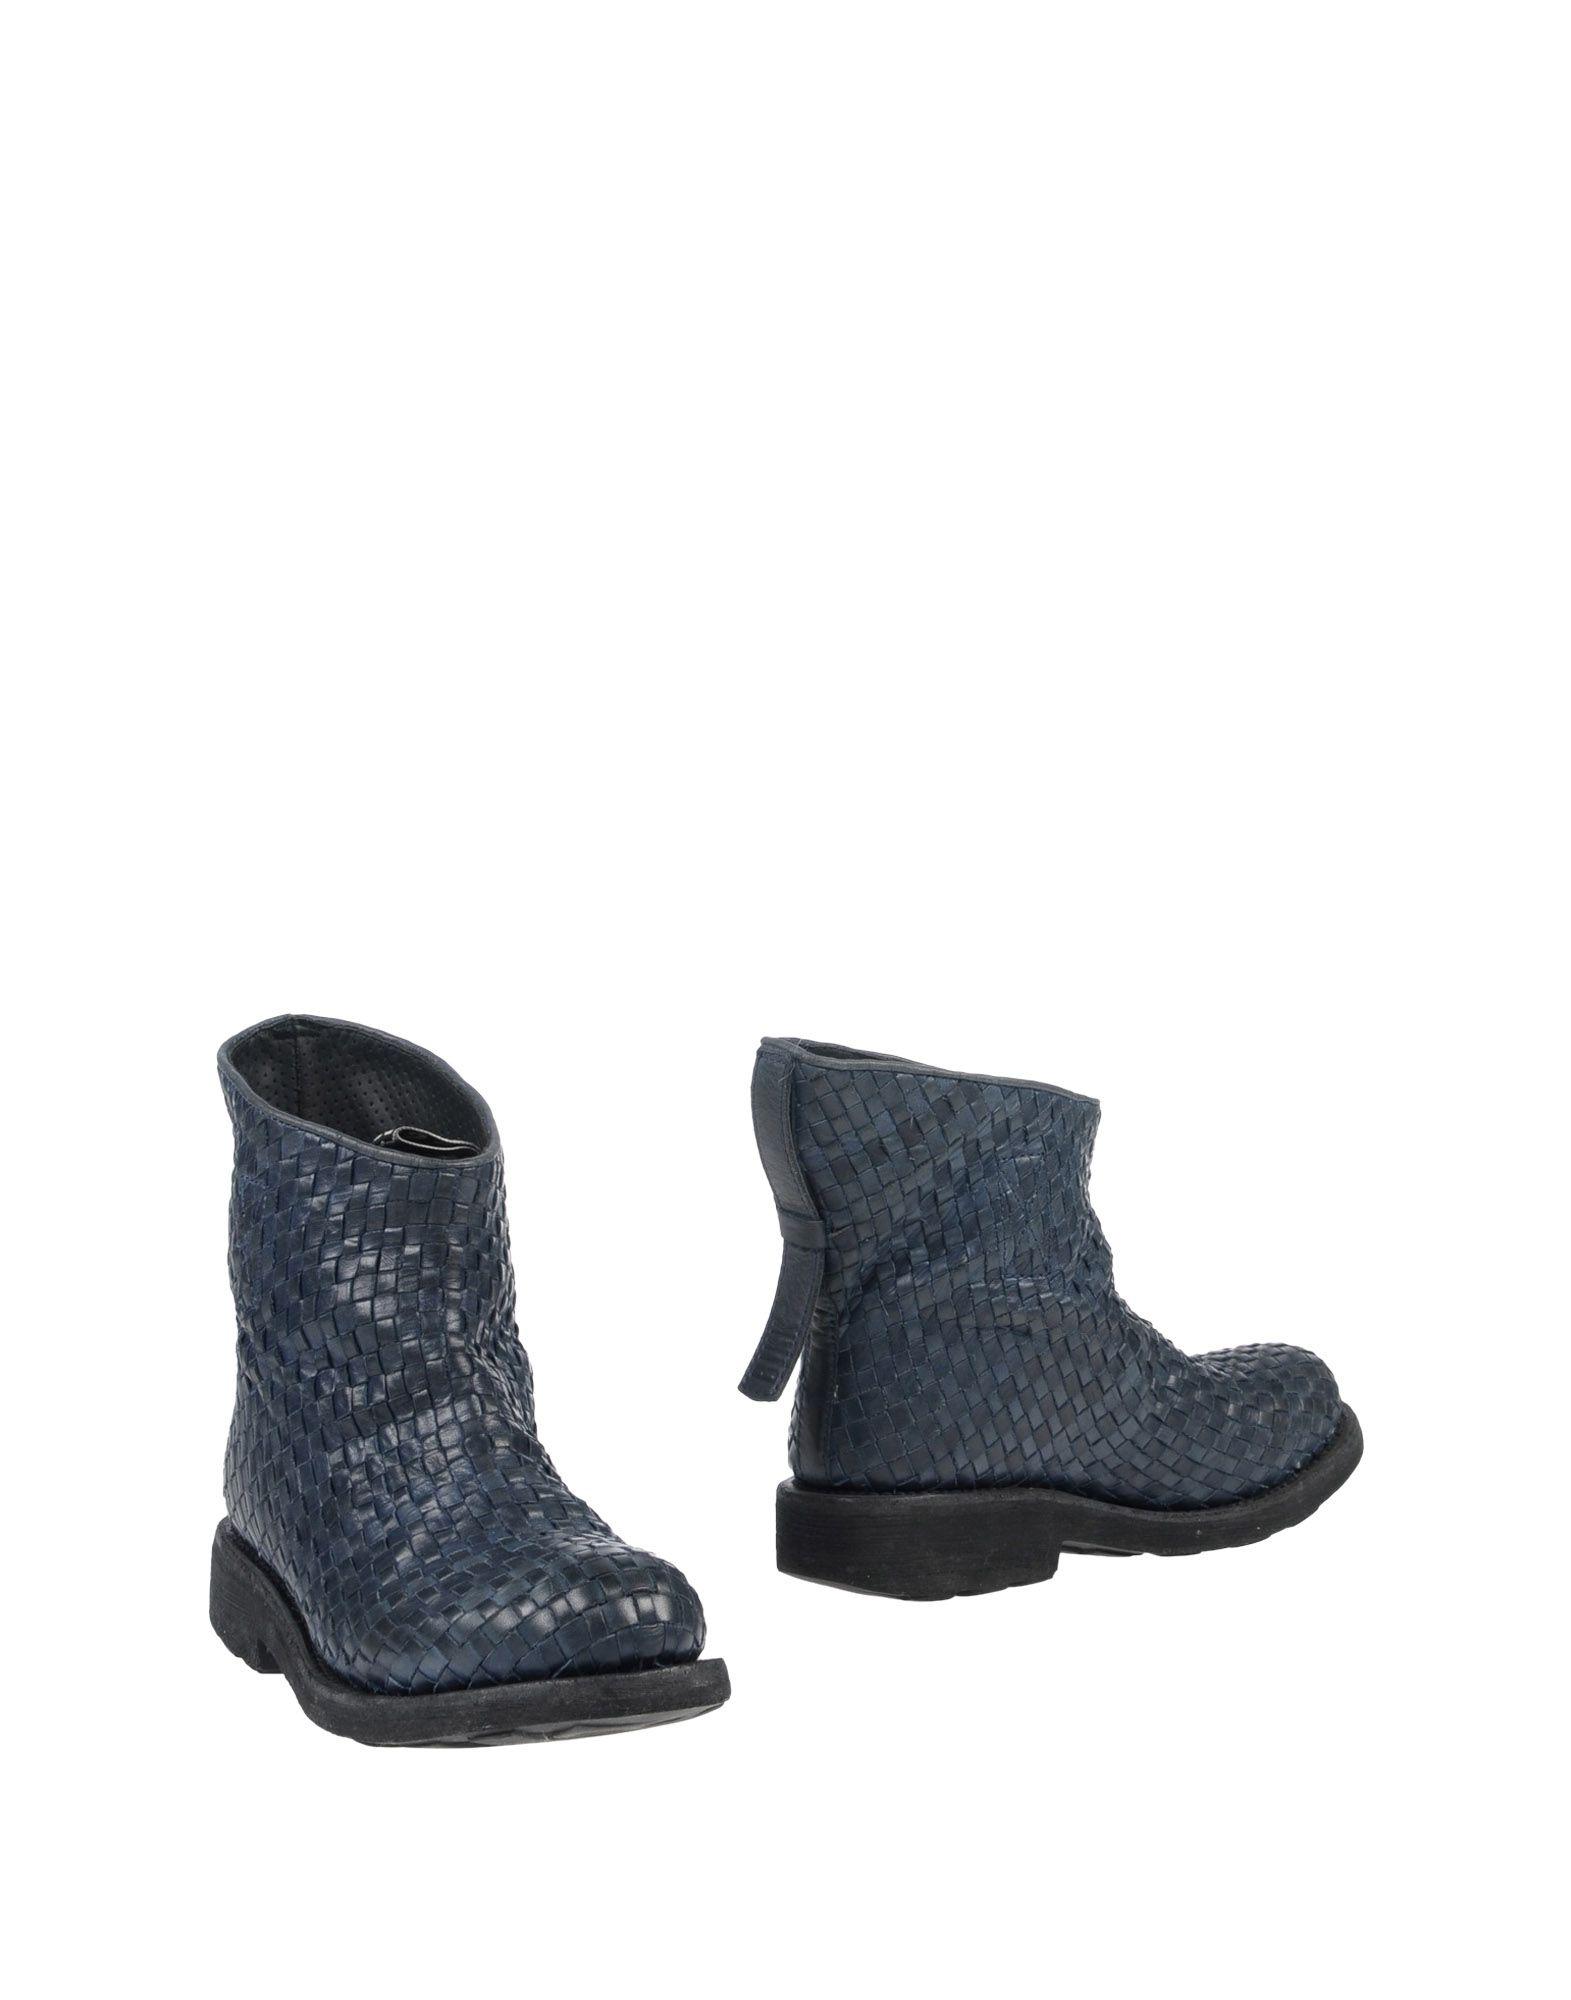 BIKKEMBERGS Полусапоги и высокие ботинки bikkembergs полусапоги и высокие ботинки